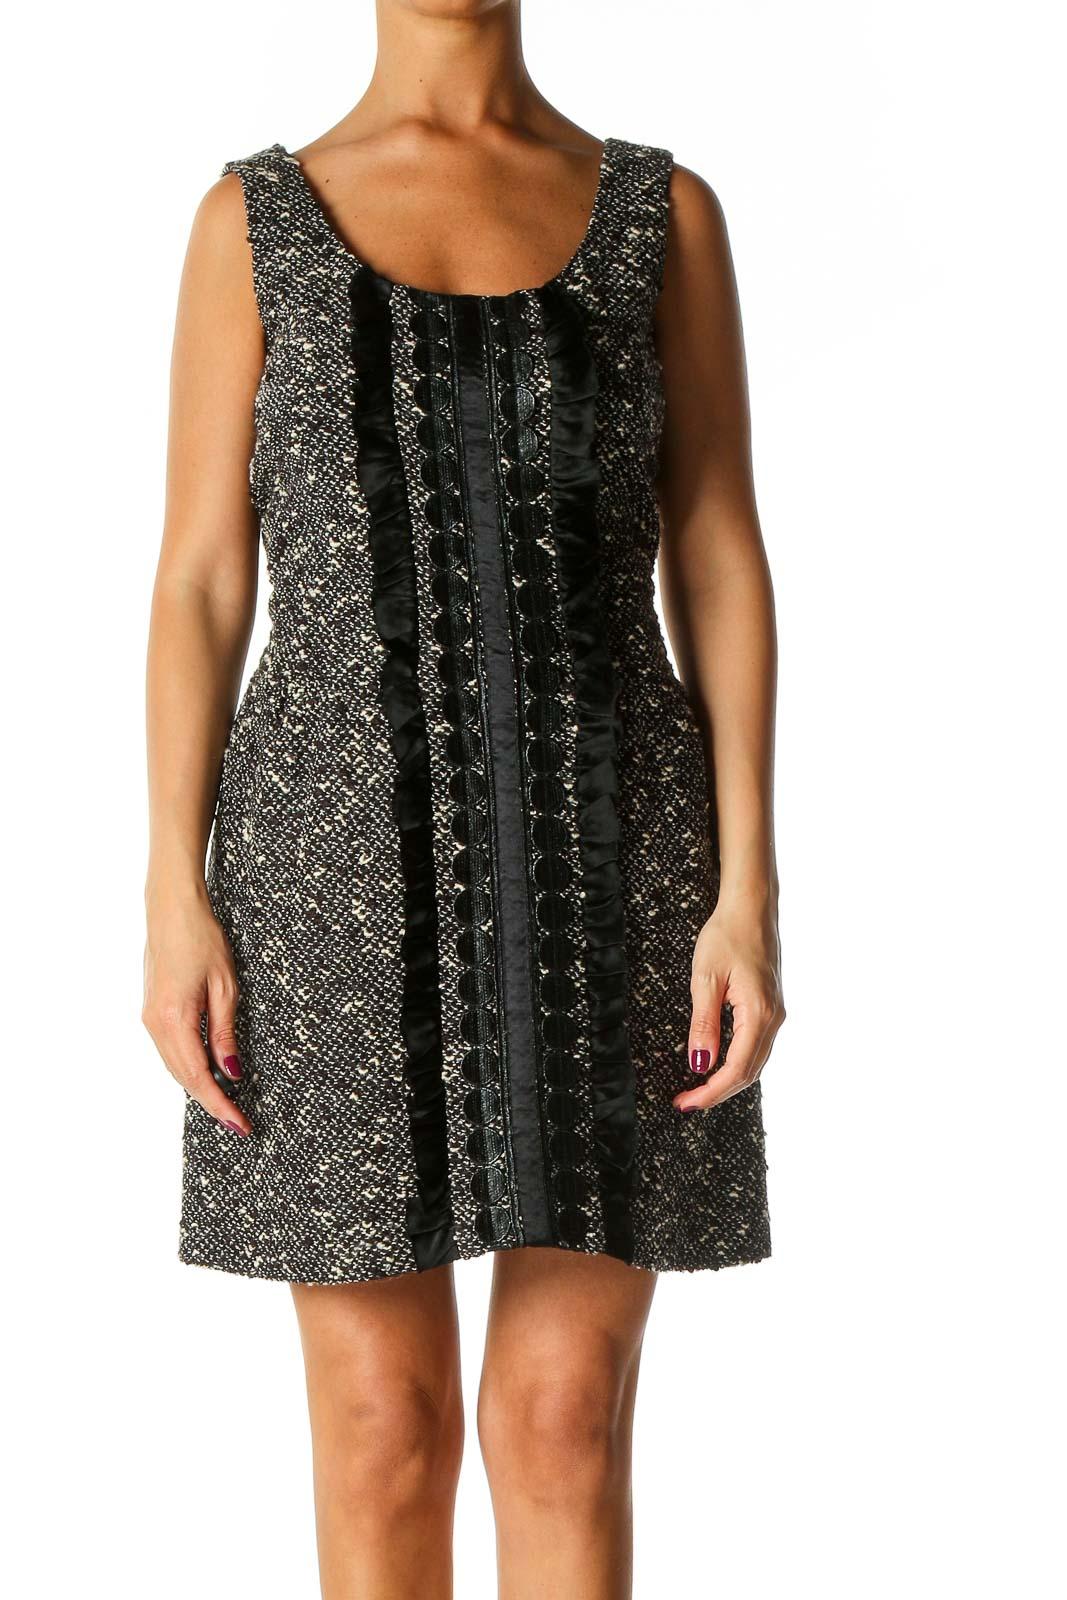 Black Textured Cocktail A-Line Dress Front